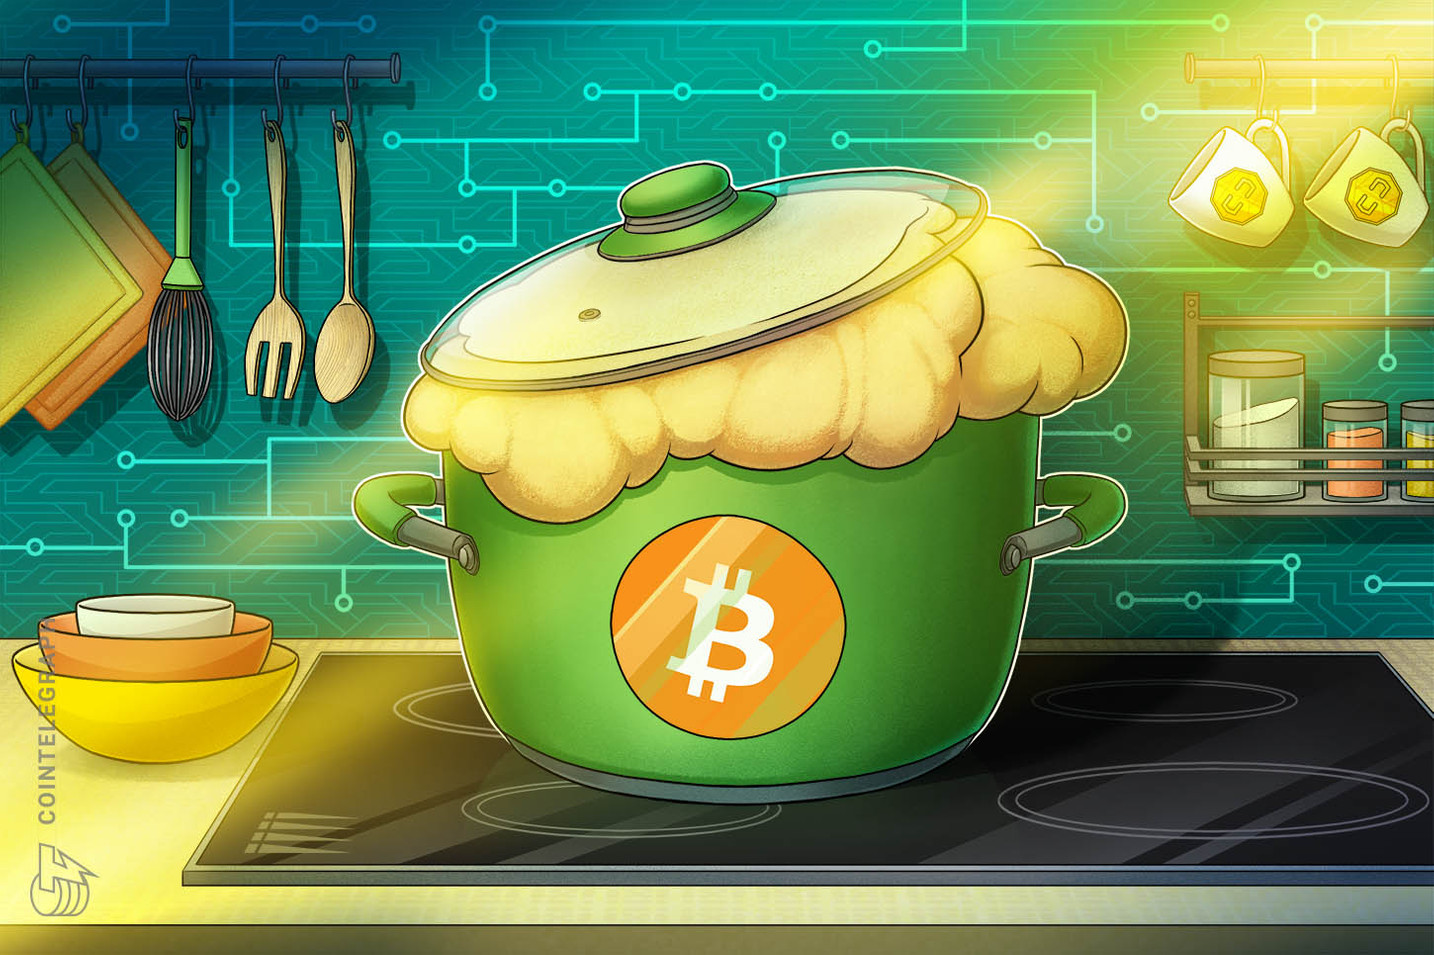 Bitcoin Price Bounces Back to $10K on Fresh Bullish Sentiment